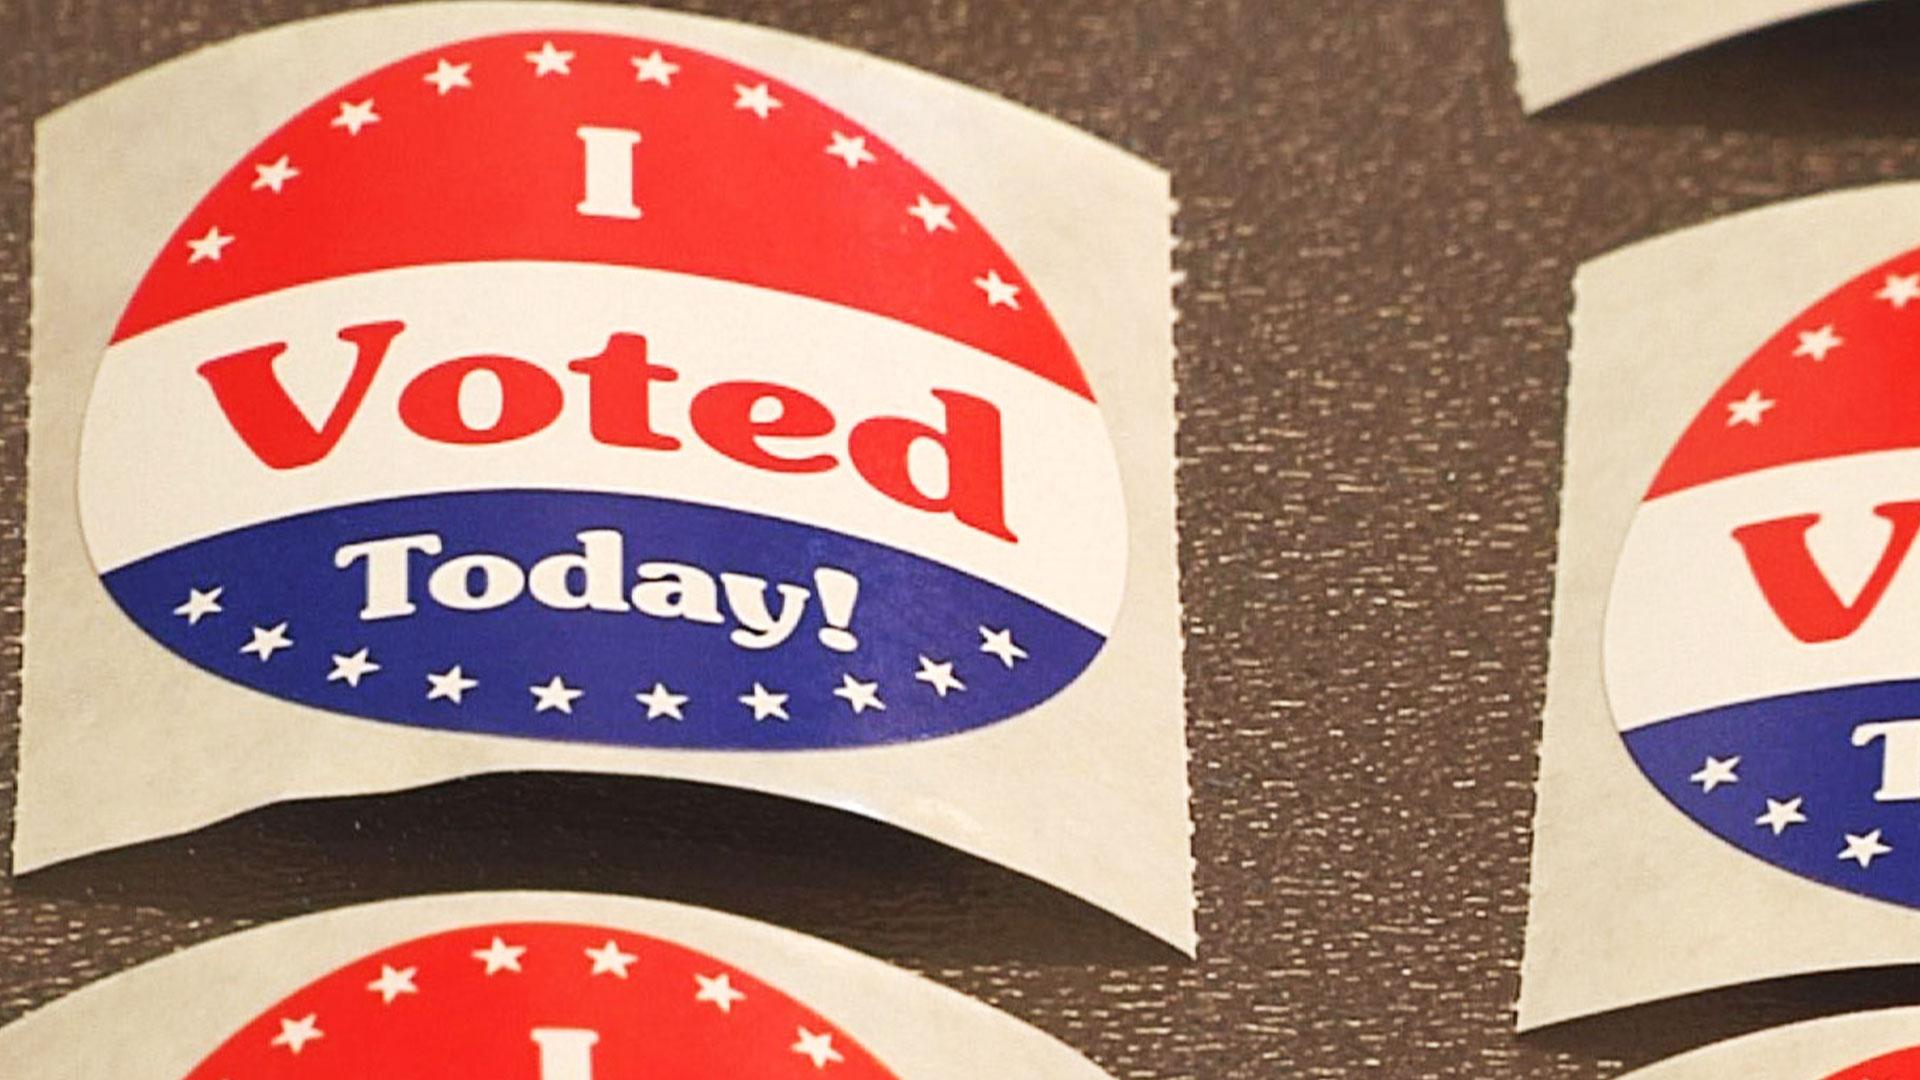 KELO Vote